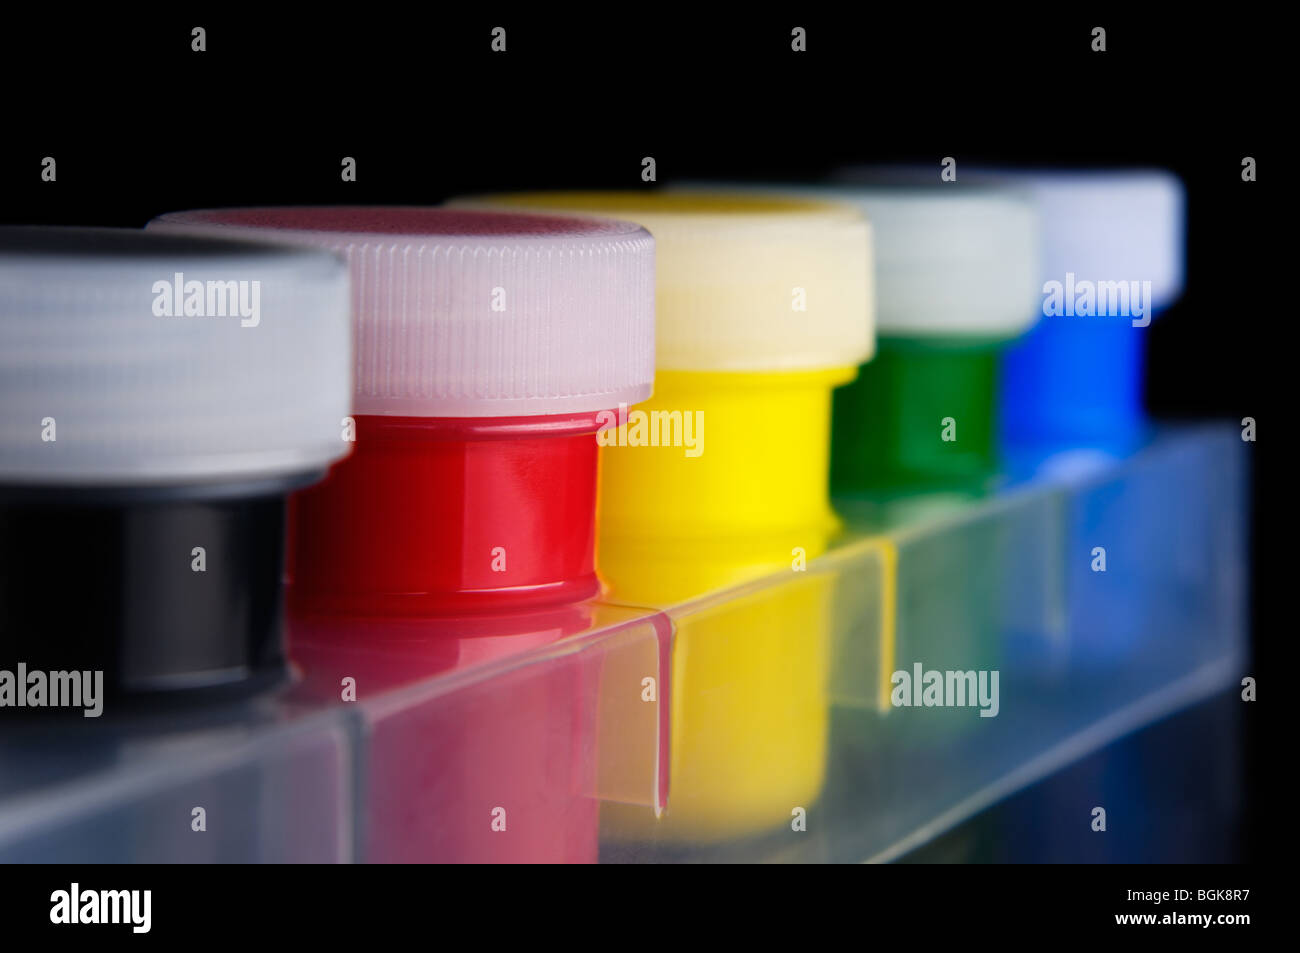 Tubes of colorful acrylic paint isolated on black background - Stock Image